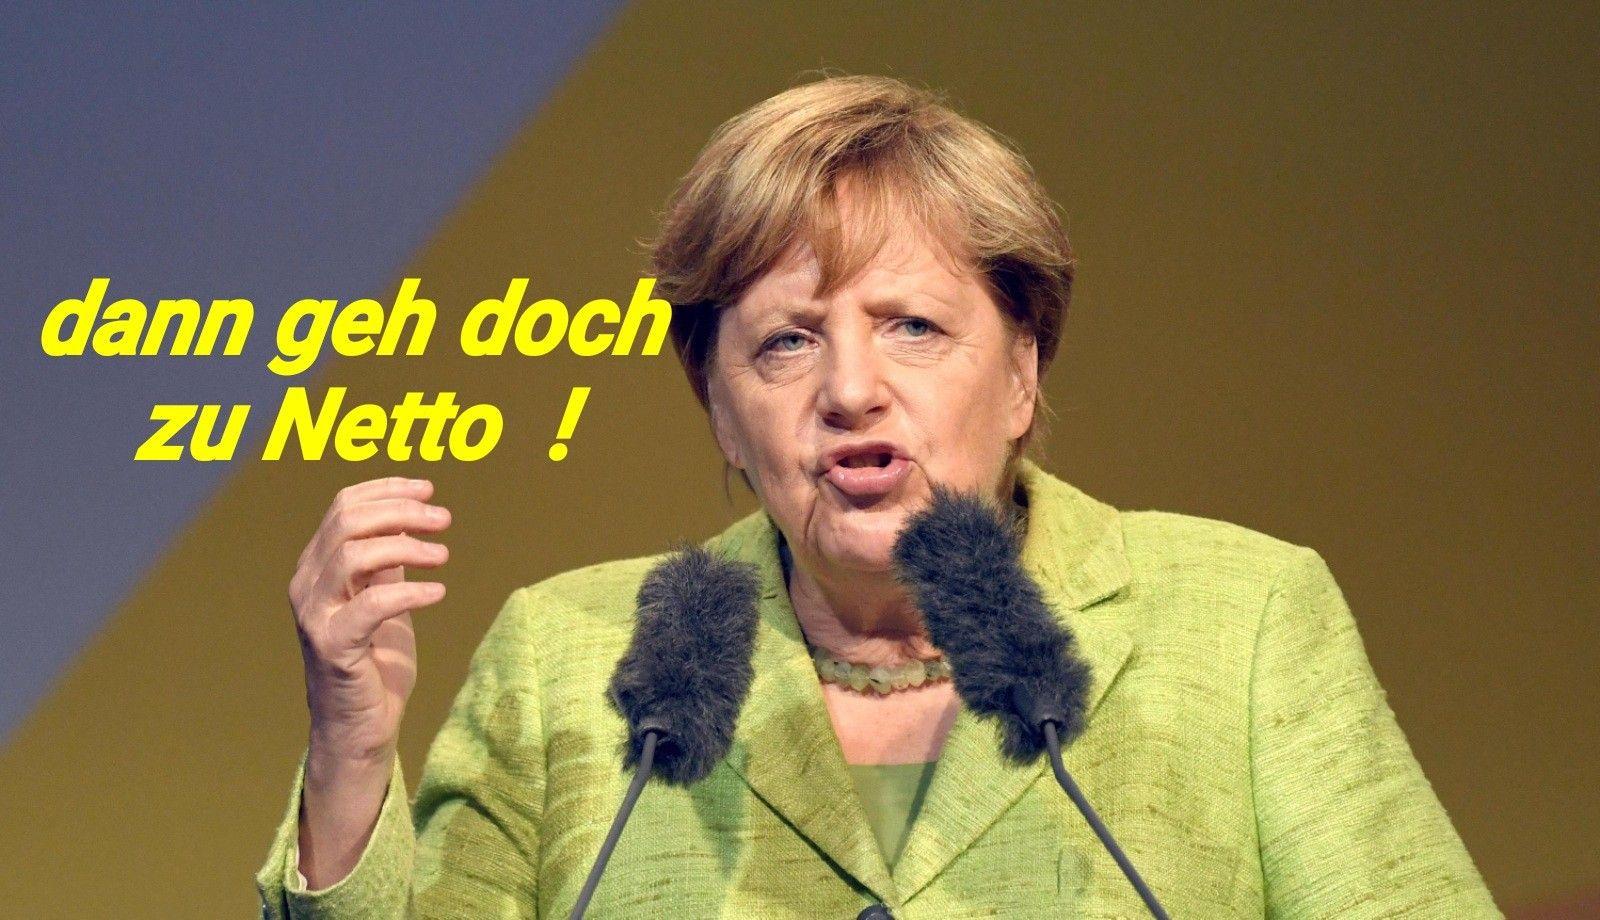 Merkel Dann Geh Doch Zu Netto Lustig Witzig Spruche Bild Bilder Lustig Witzige Spruche Lustige Spruche